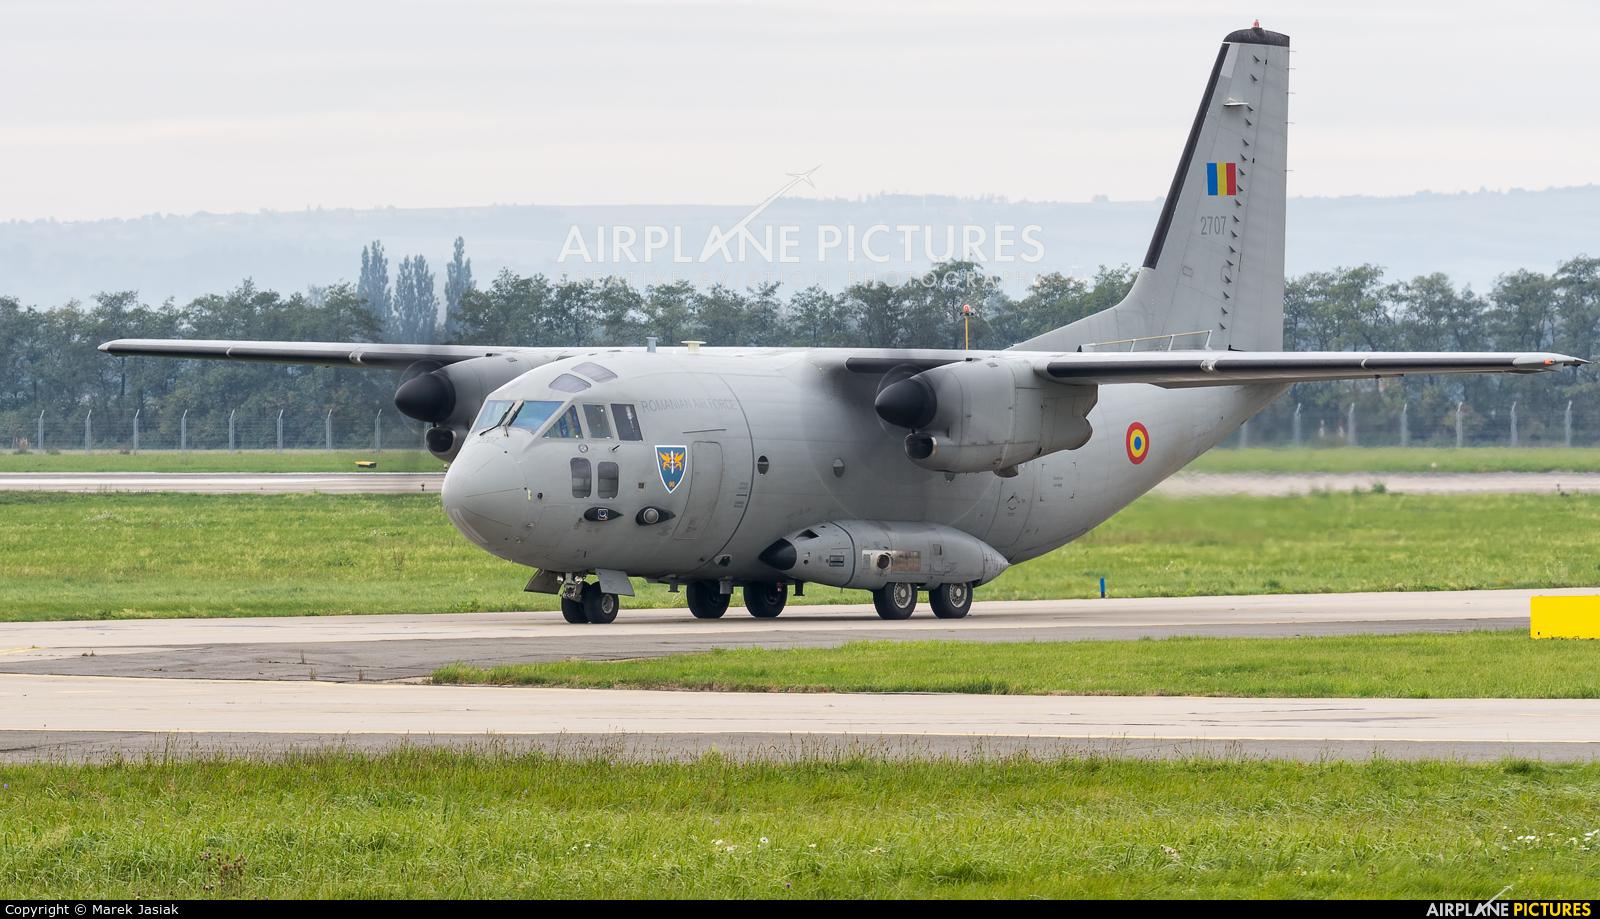 Romania - Air Force 2707 aircraft at Ostrava Mošnov